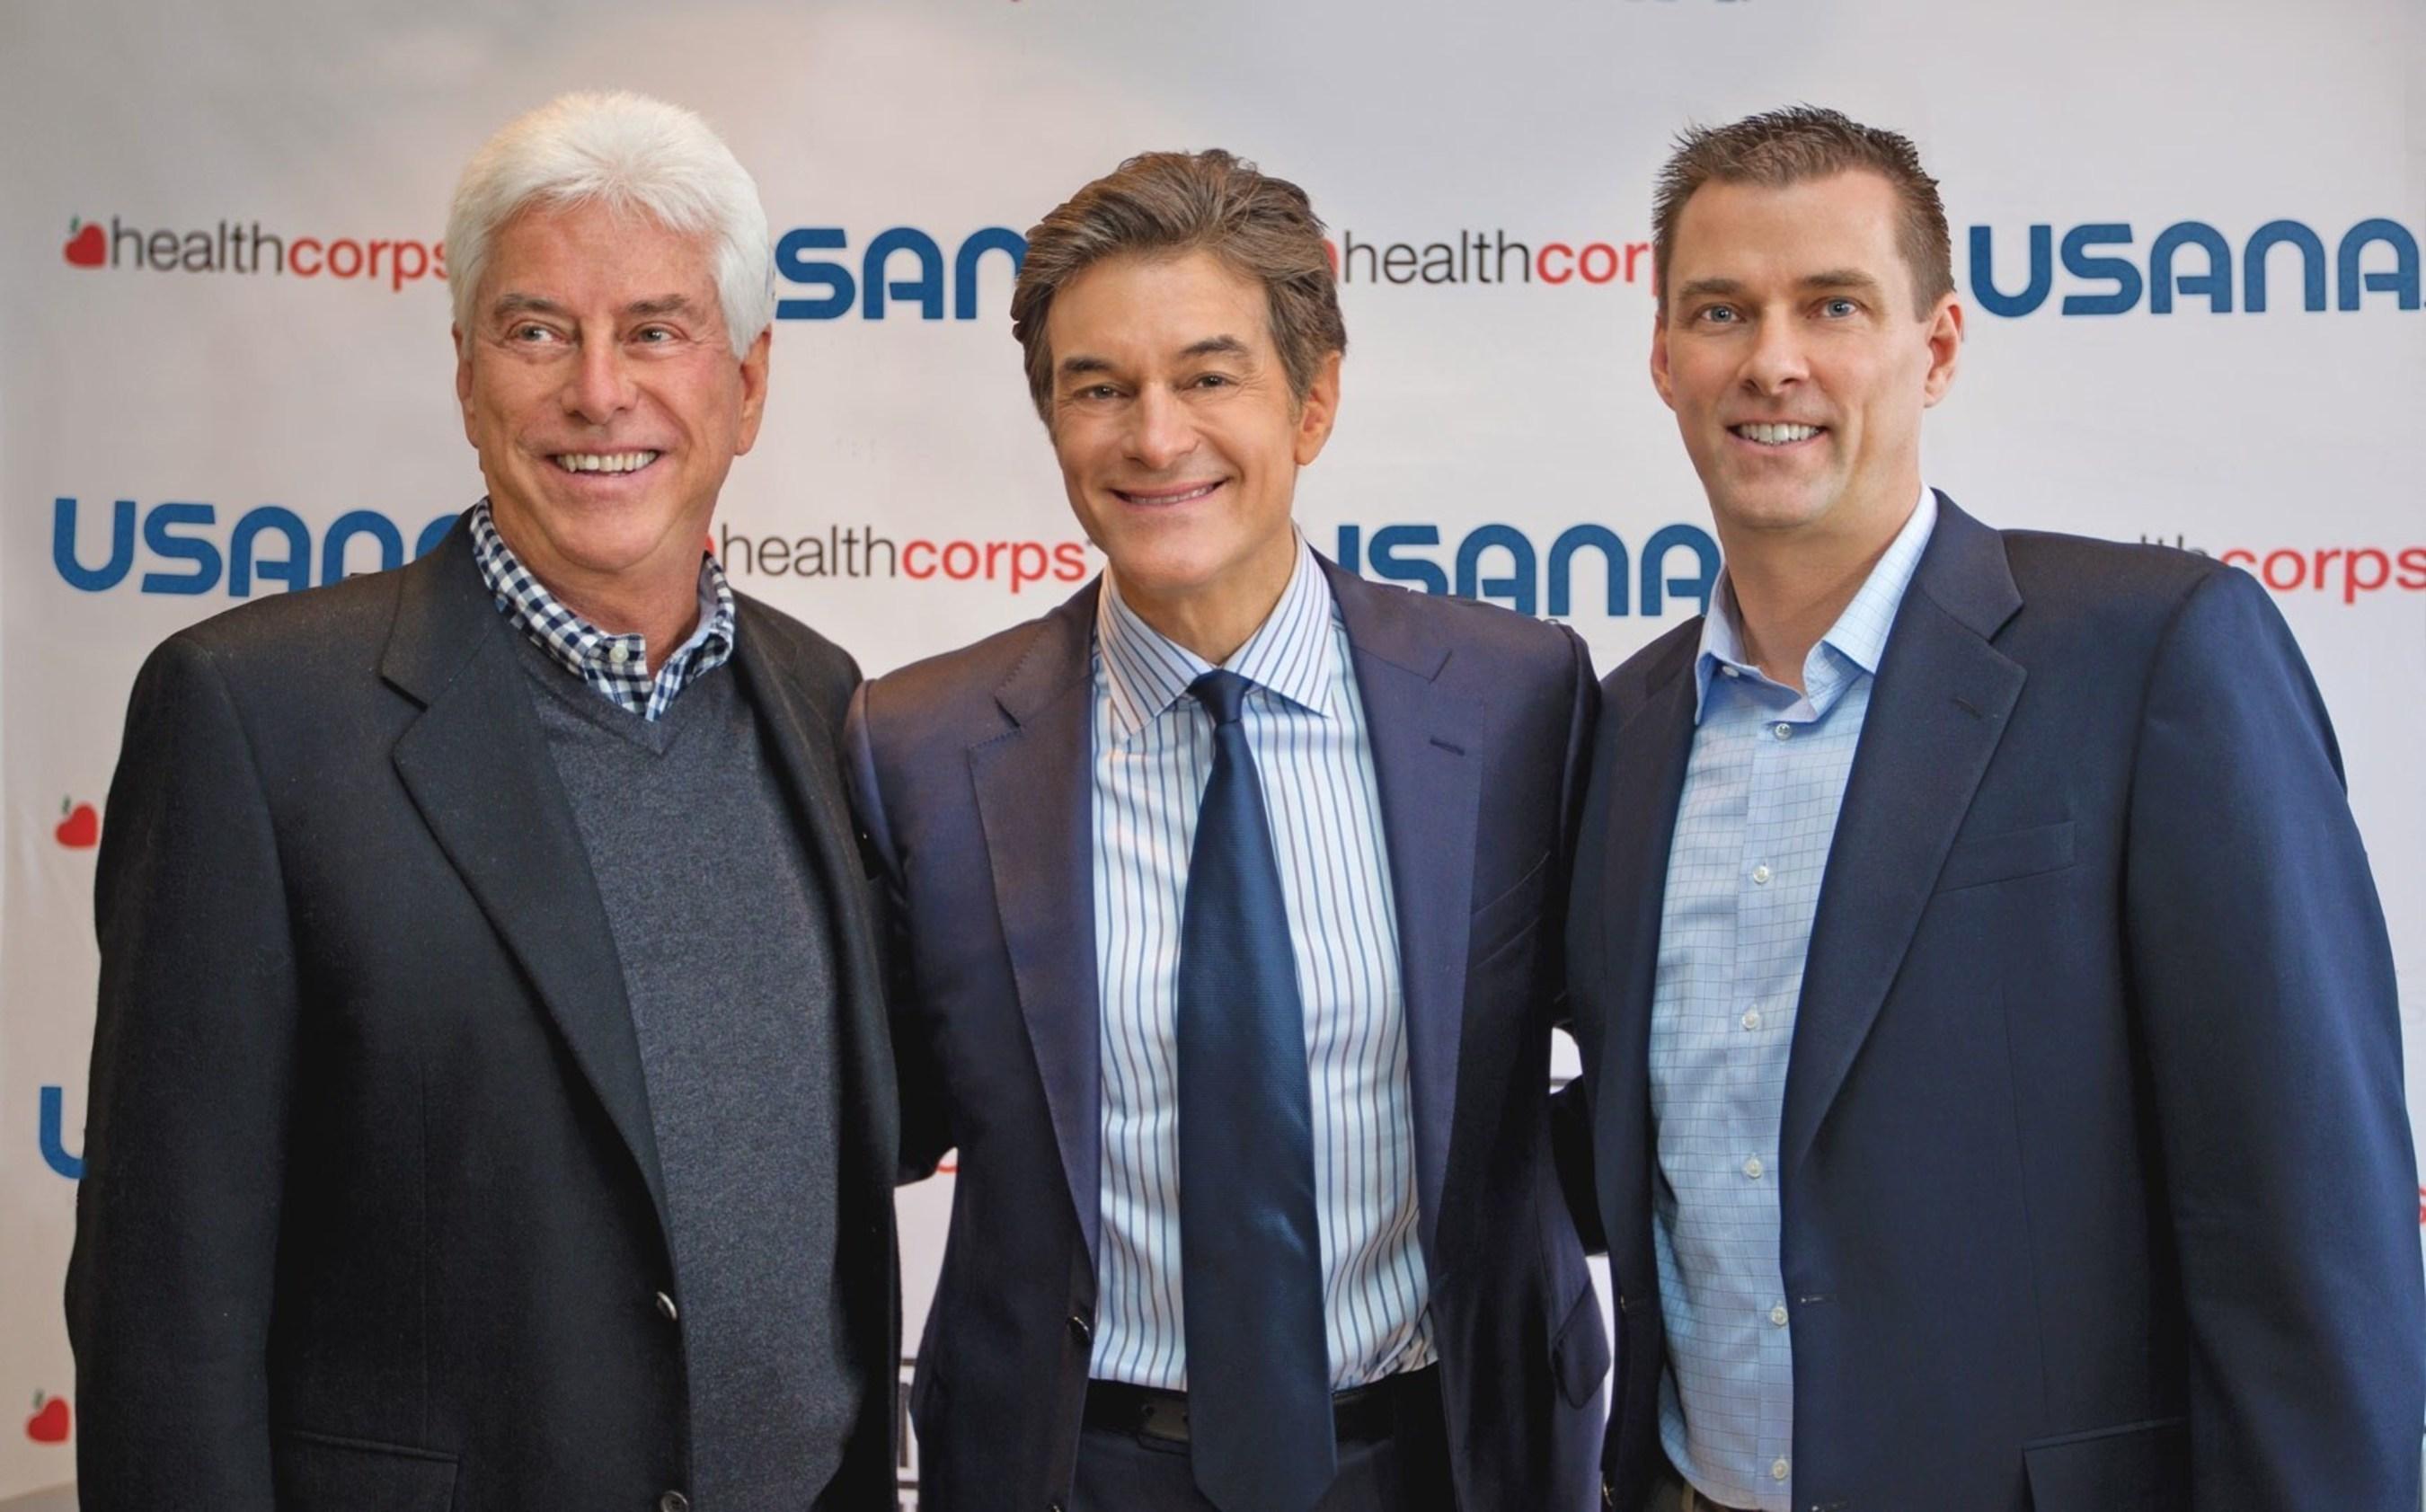 Dr. Myron Wentz, Dr. Mehmet Oz and Dave Wentz